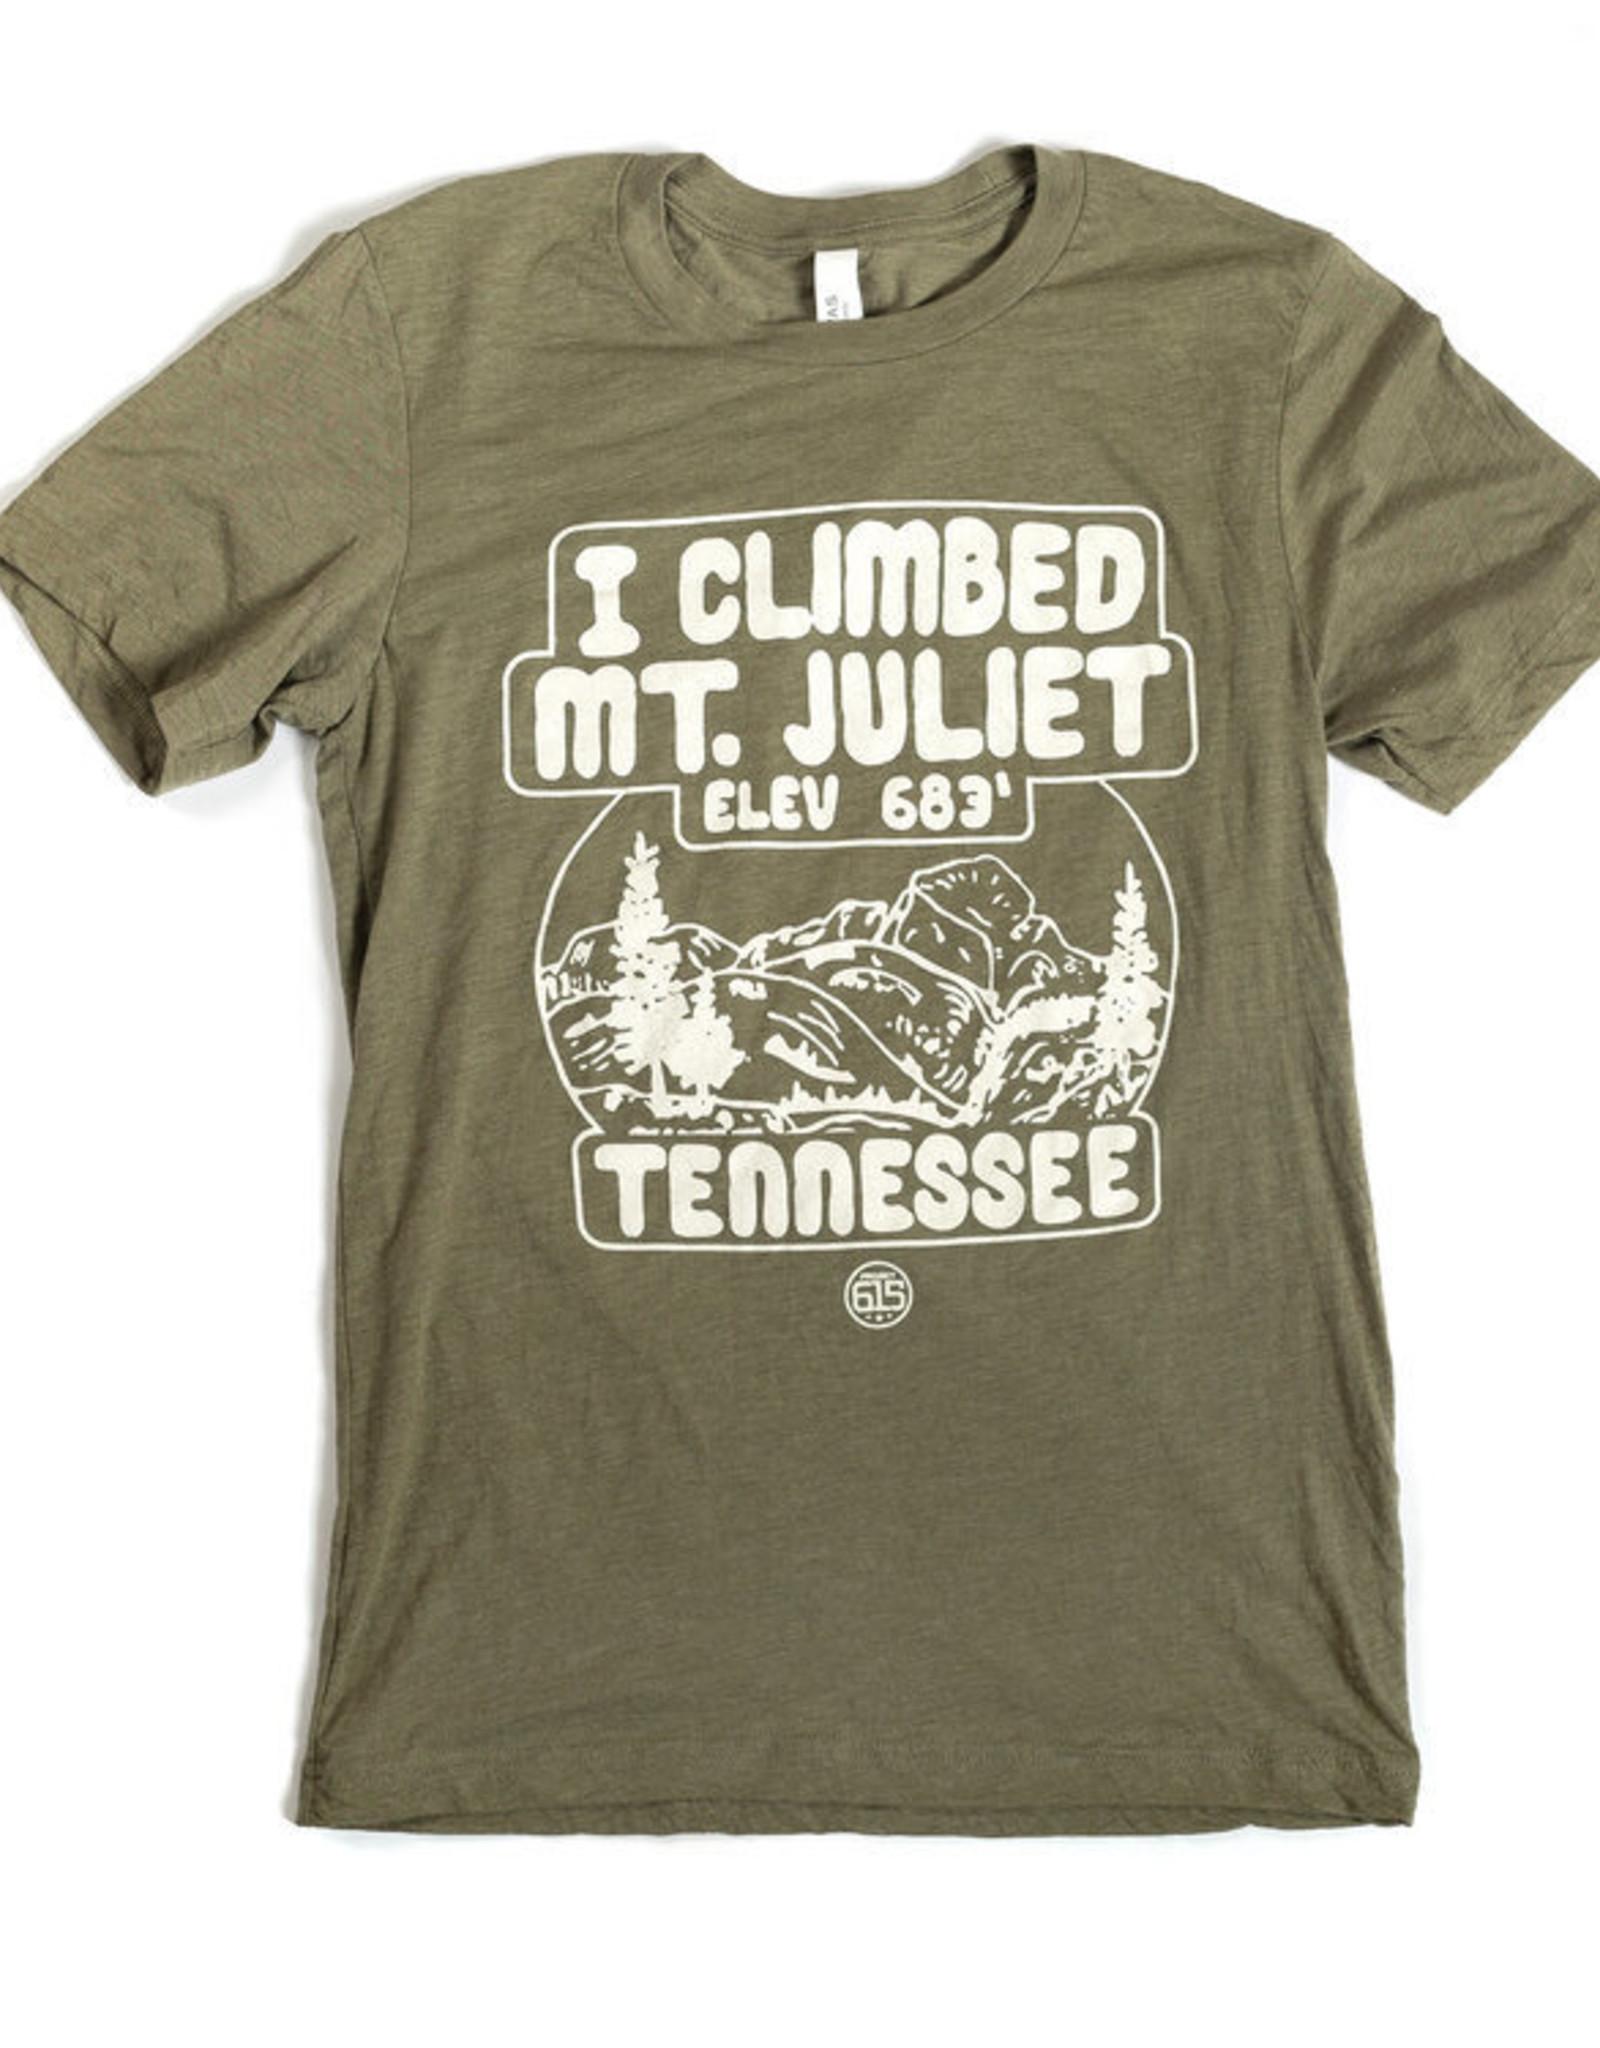 Project 615 Project 615 Tshirt- I Climbed Mt Juliet